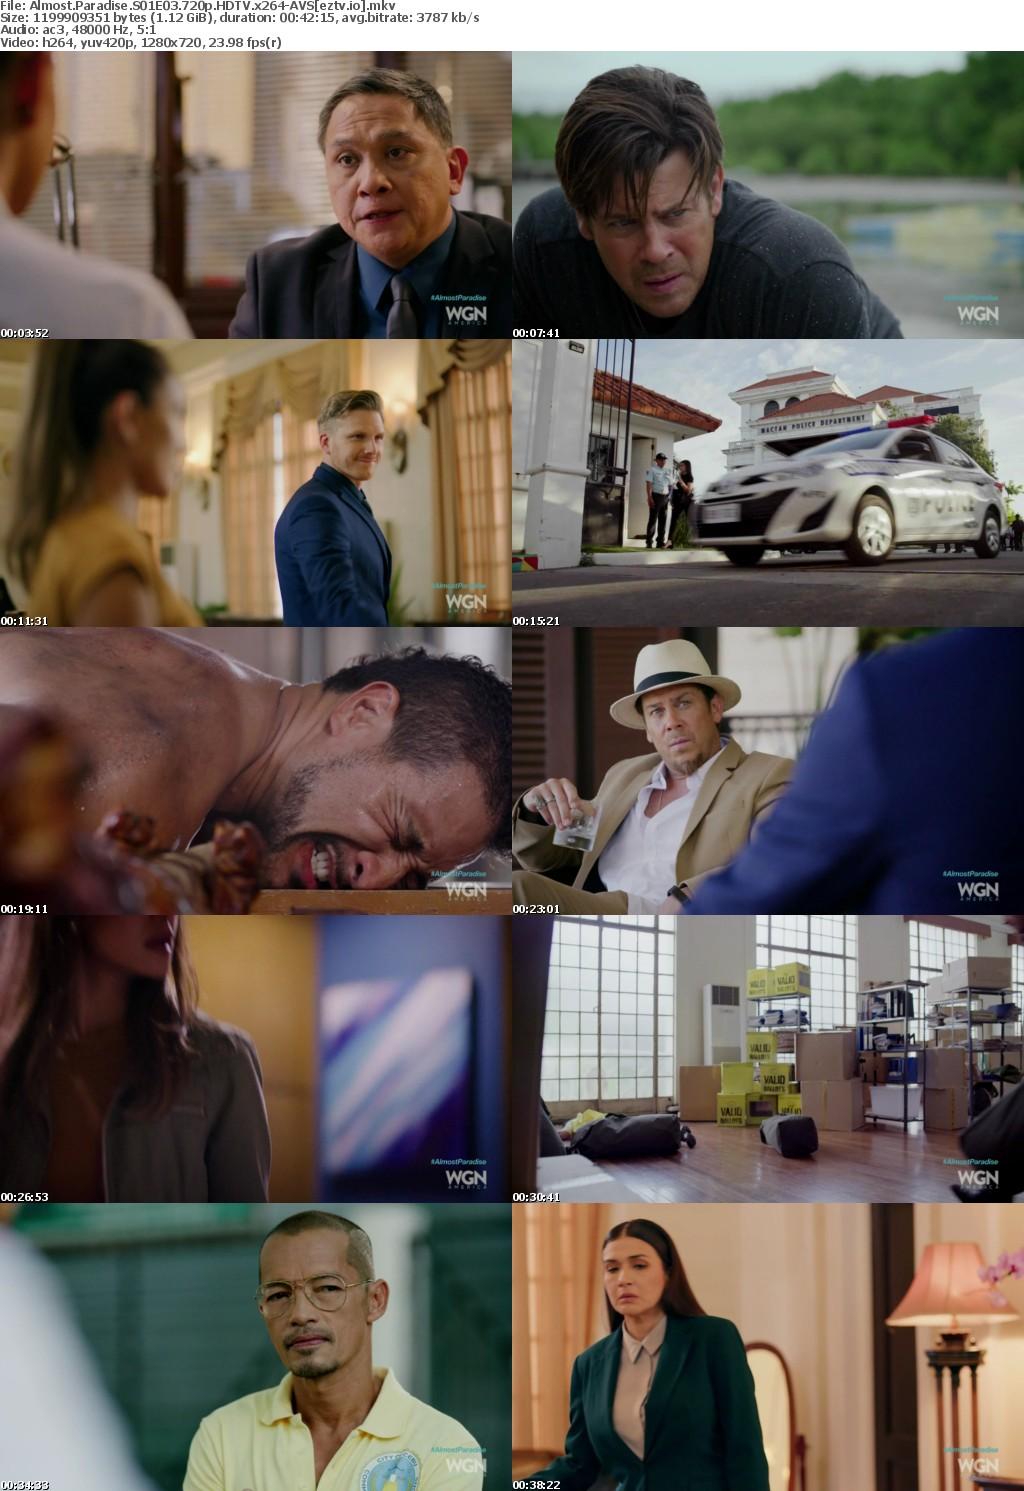 Almost Paradise S01E03 720p HDTV x264-AVS